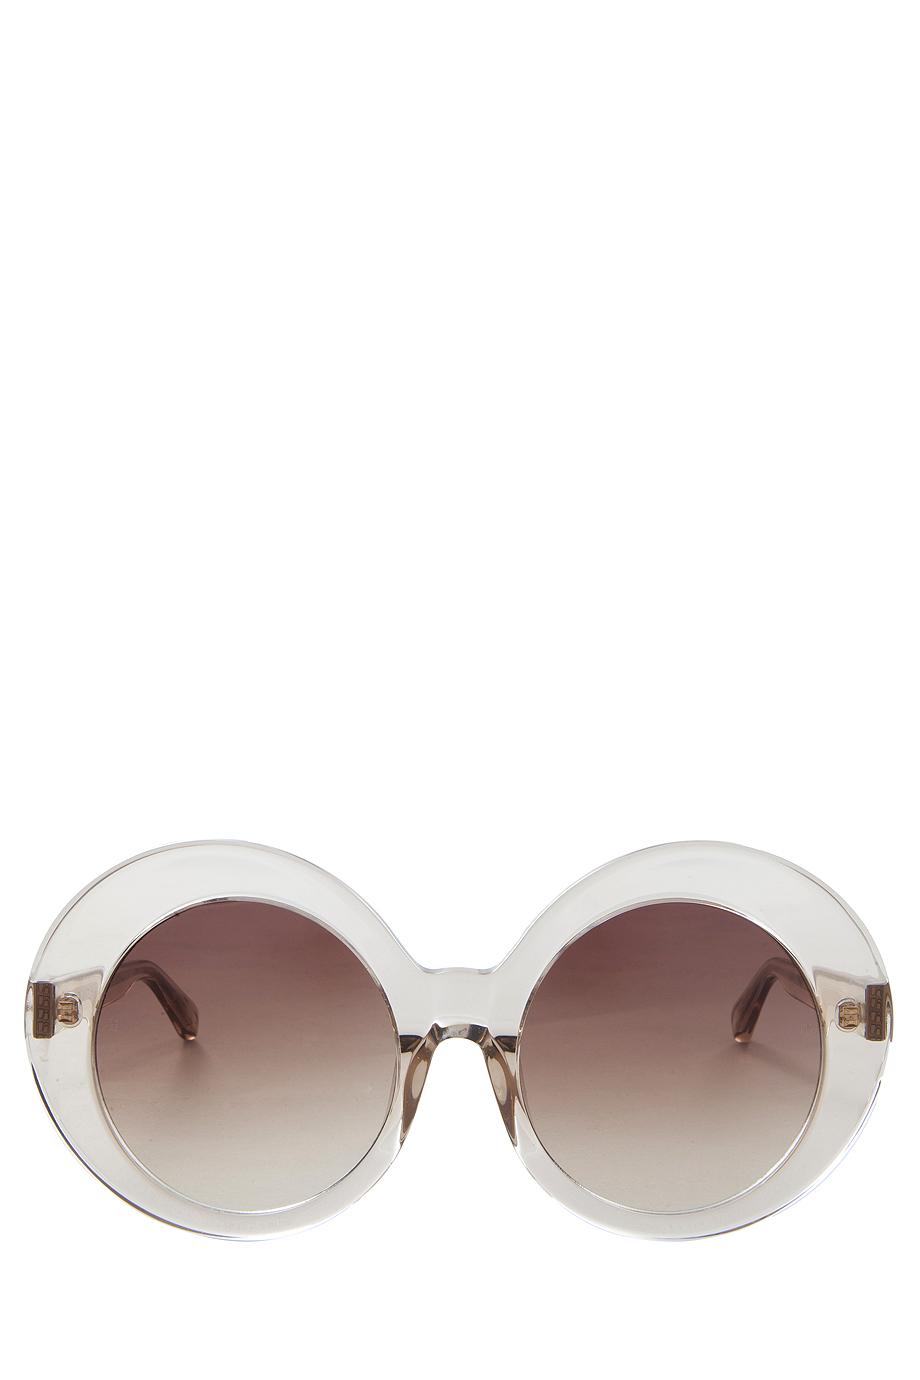 Linda Farrow  Pink Acetate Round Sunglasses  Lyst